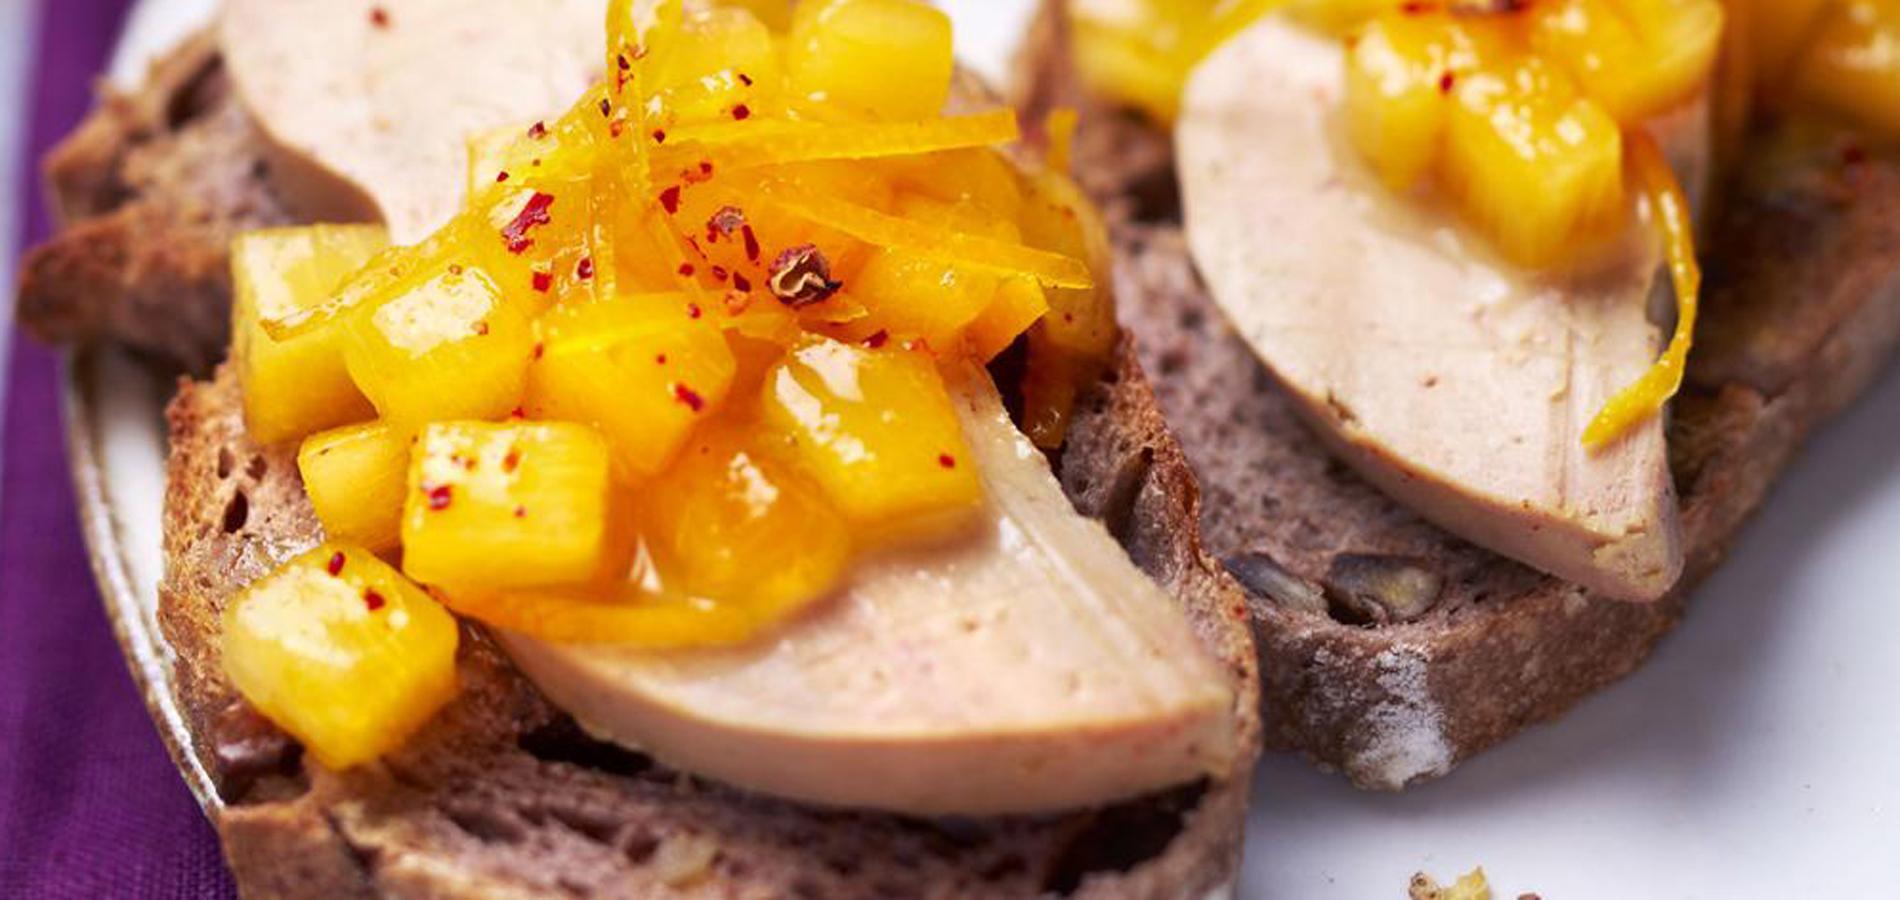 recette tartine au foie gras et kakis cuisine madame. Black Bedroom Furniture Sets. Home Design Ideas